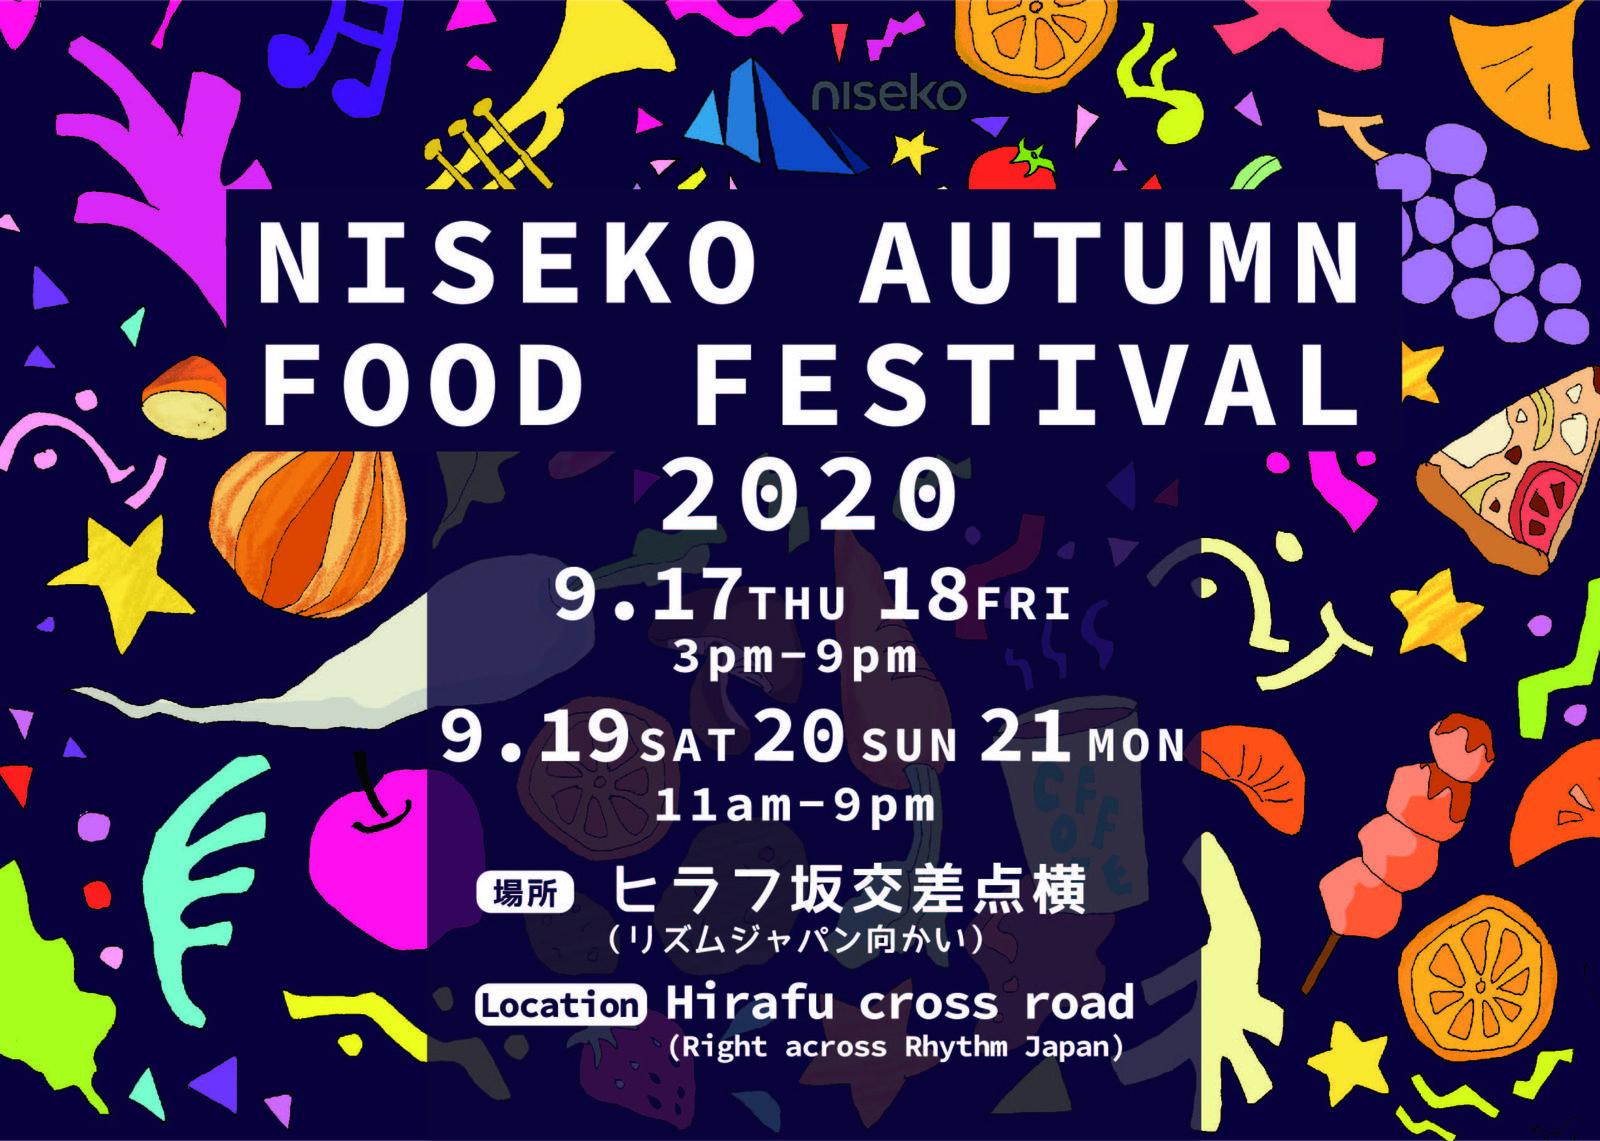 Niseko Autumn Food Festival 2020